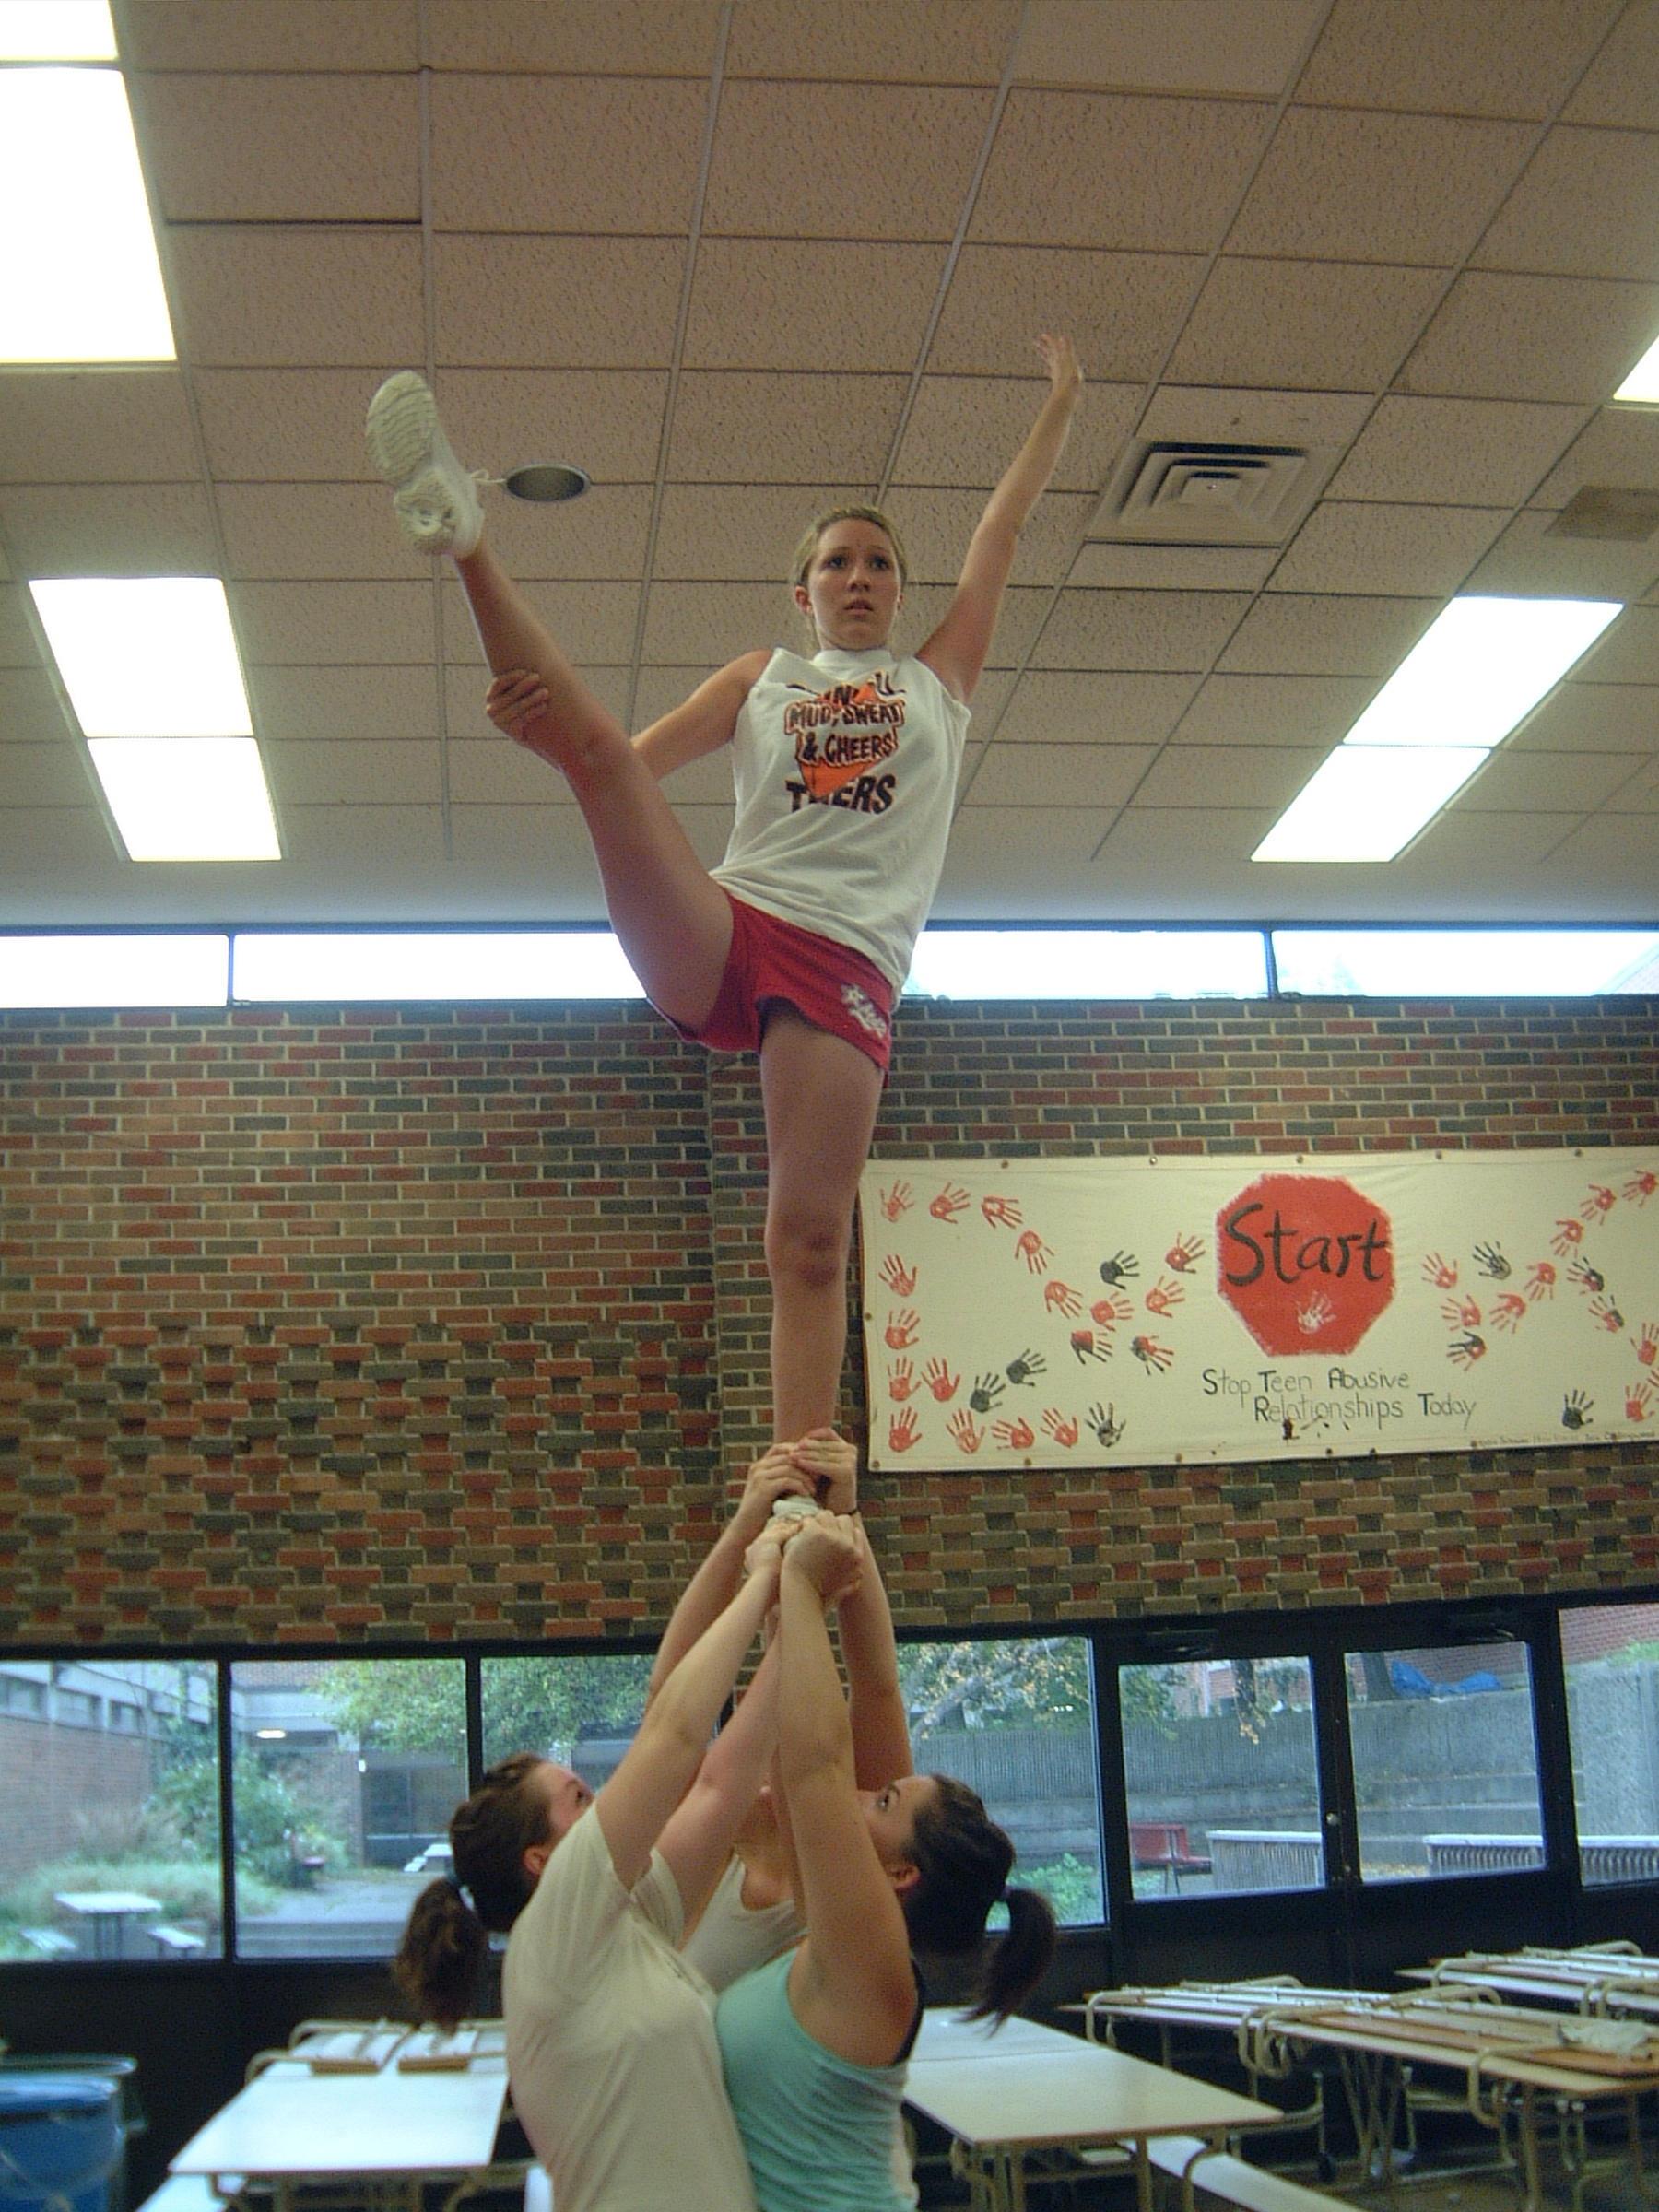 For cheerleaders show too much skin cheerleading heel stretch